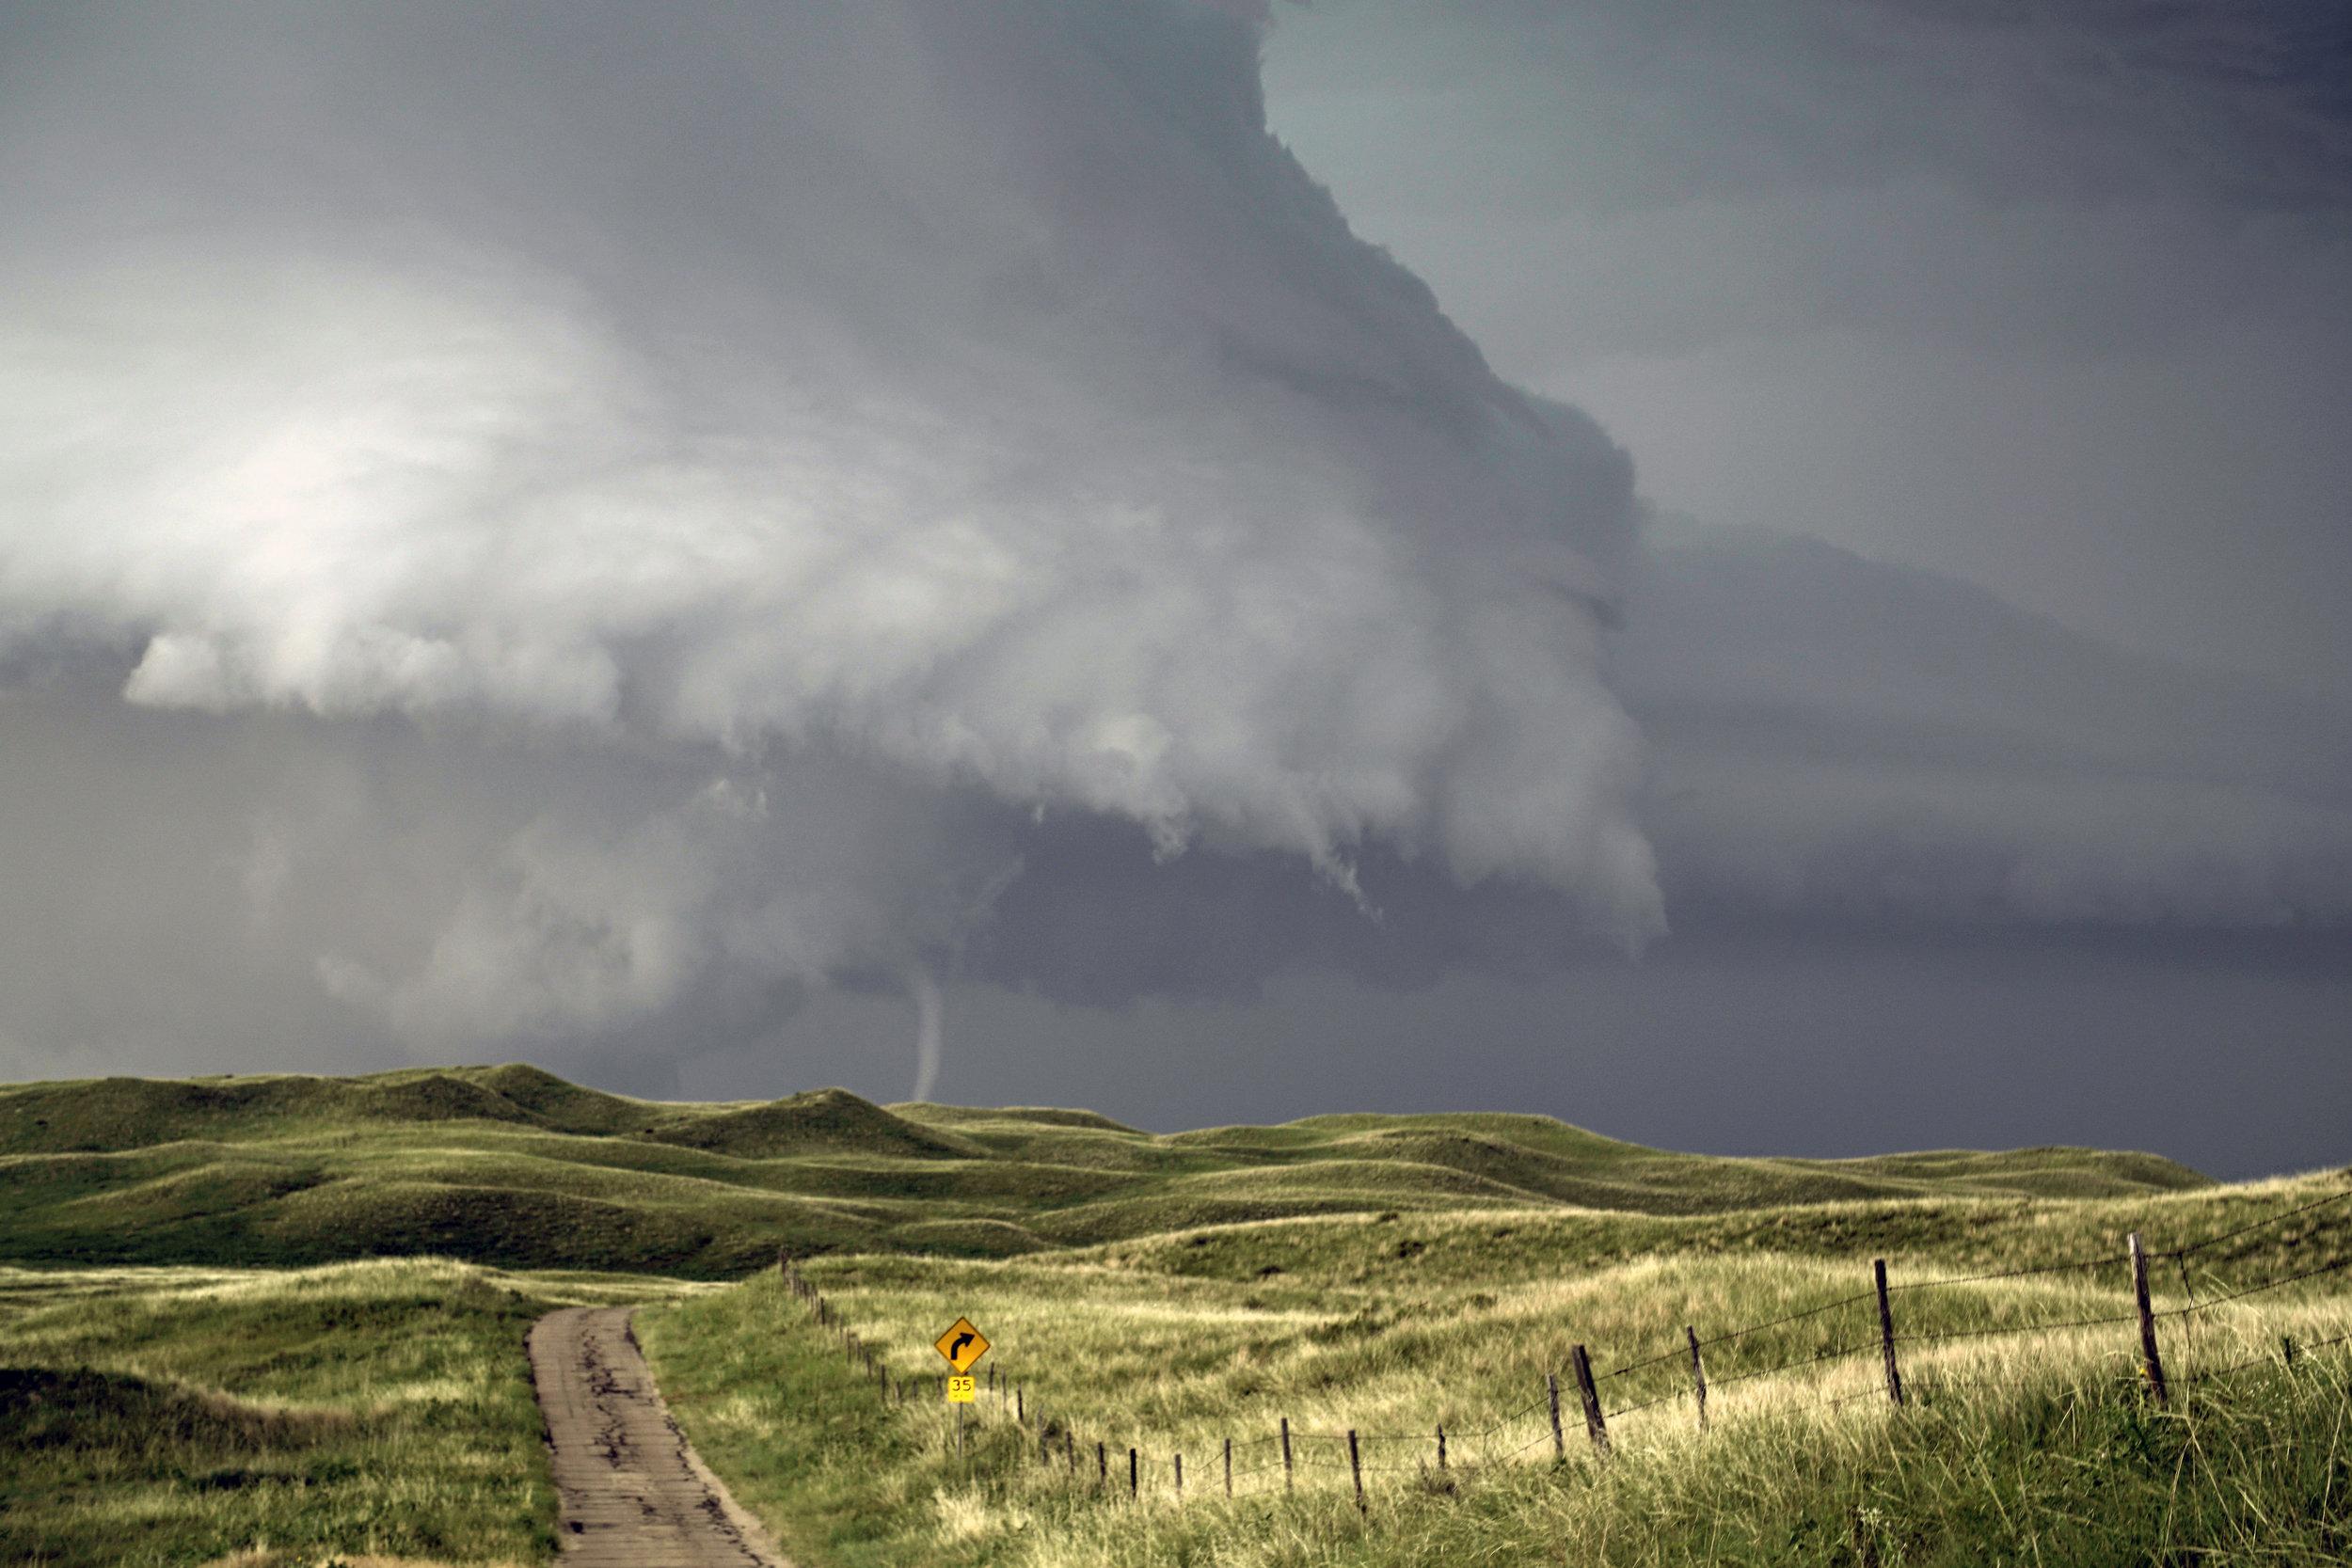 A massive supercell thunderstorm spawns a tornado in the sand hills region of Nebraska.